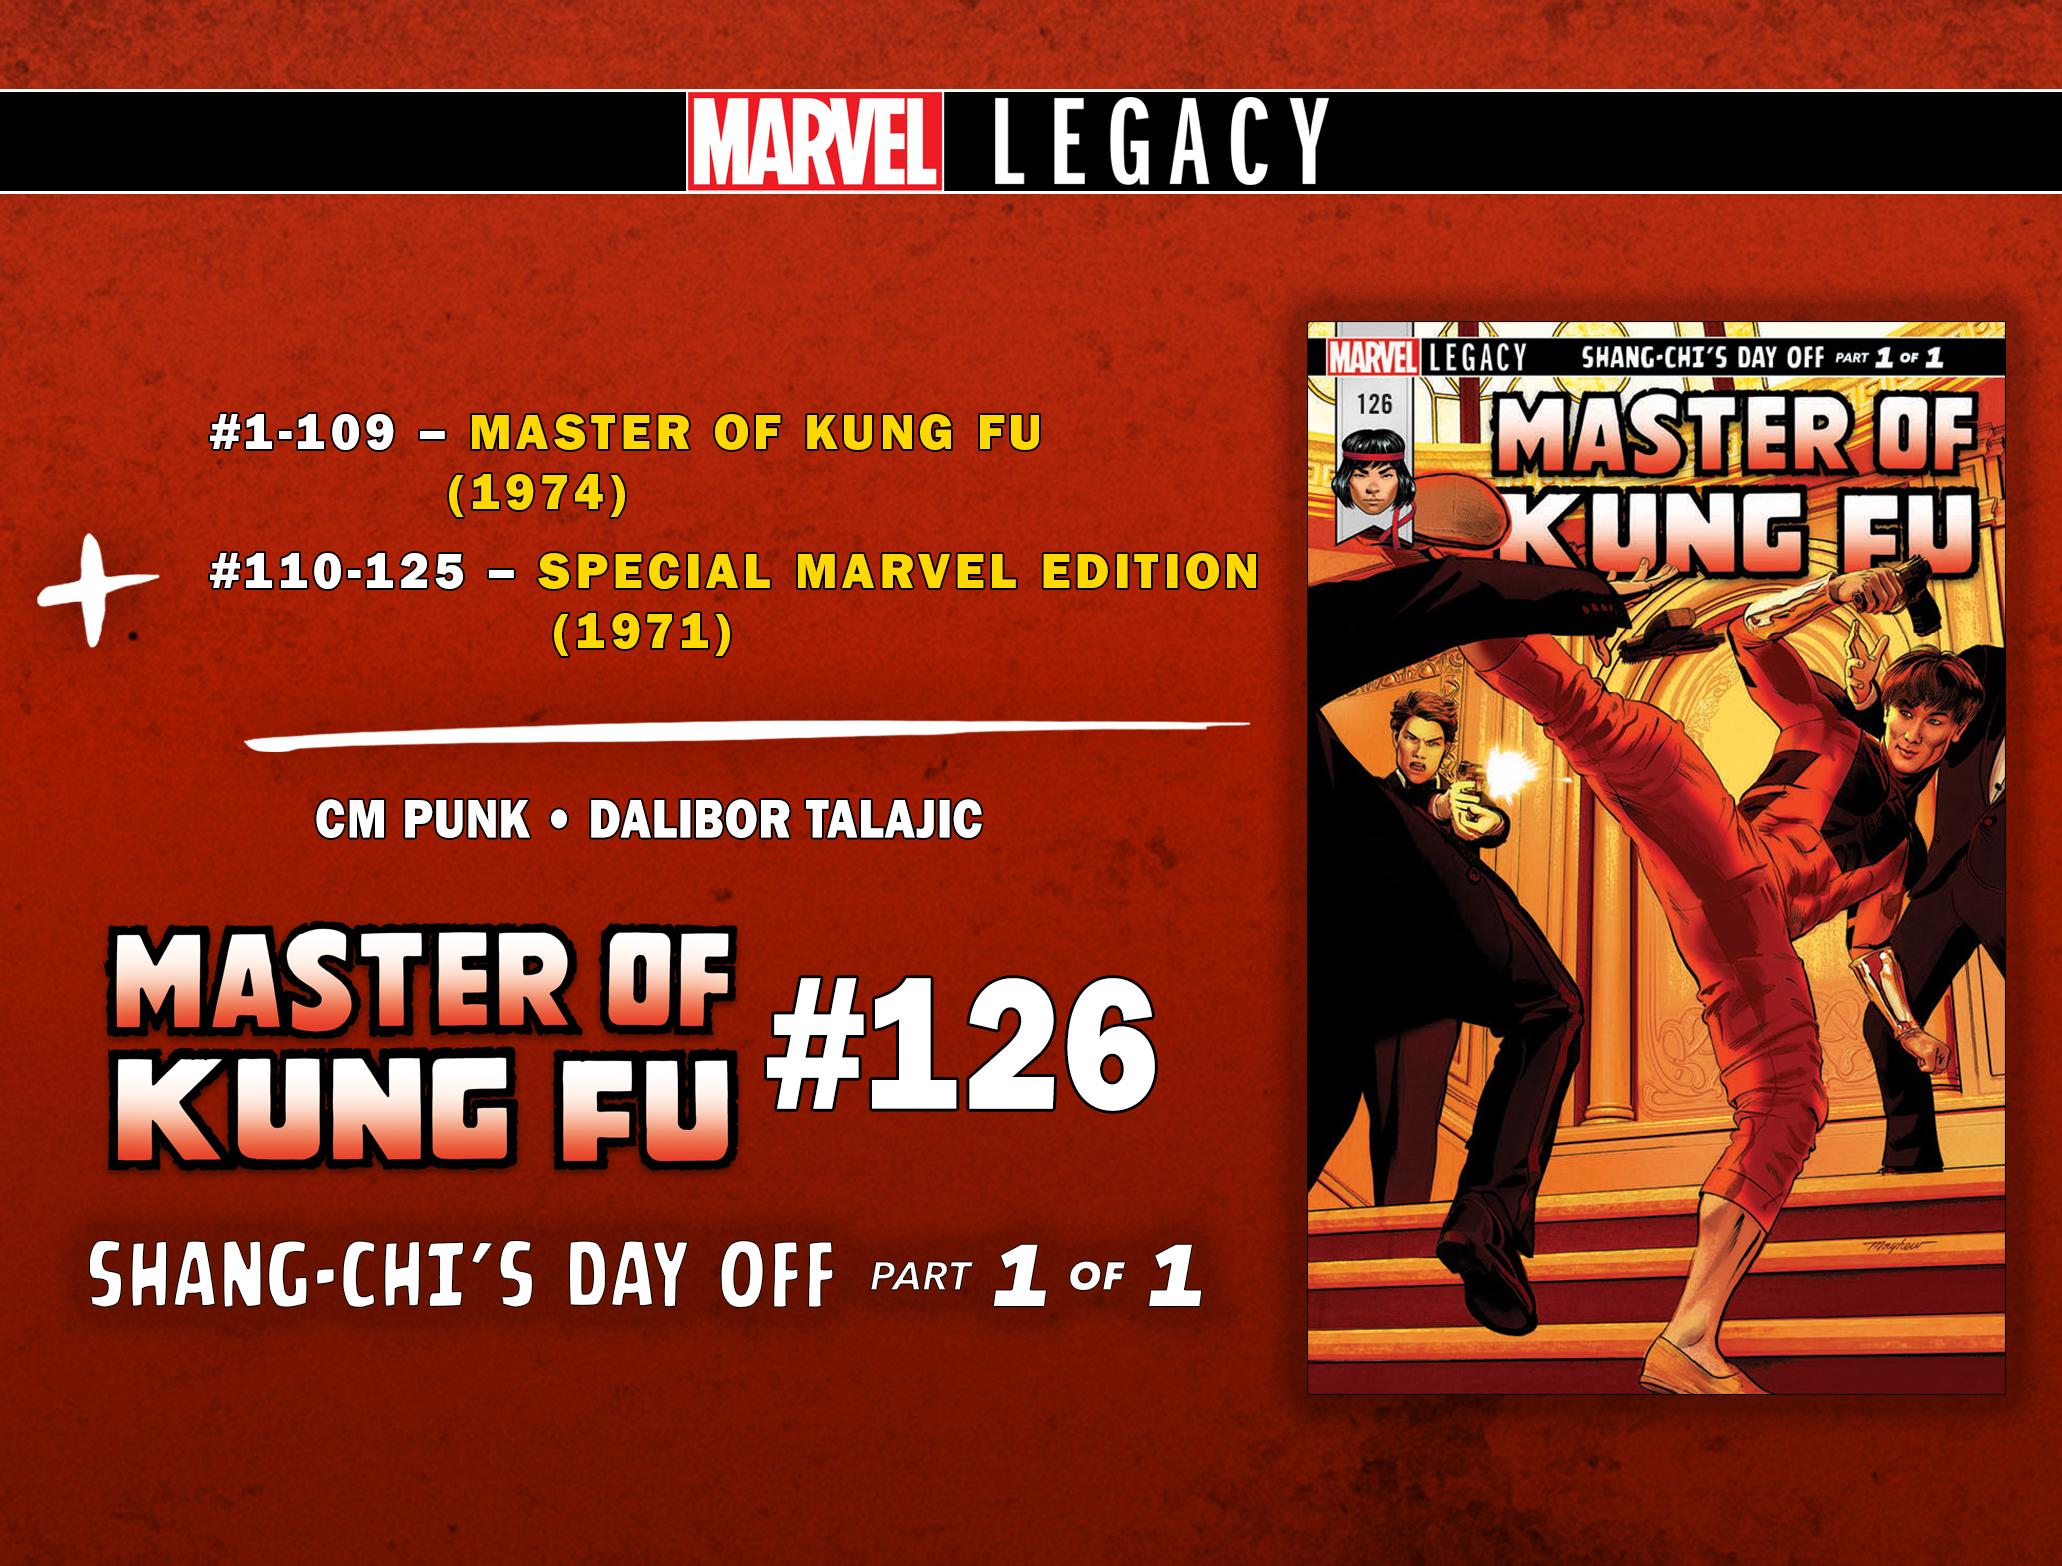 Master of Kung-Fu #126